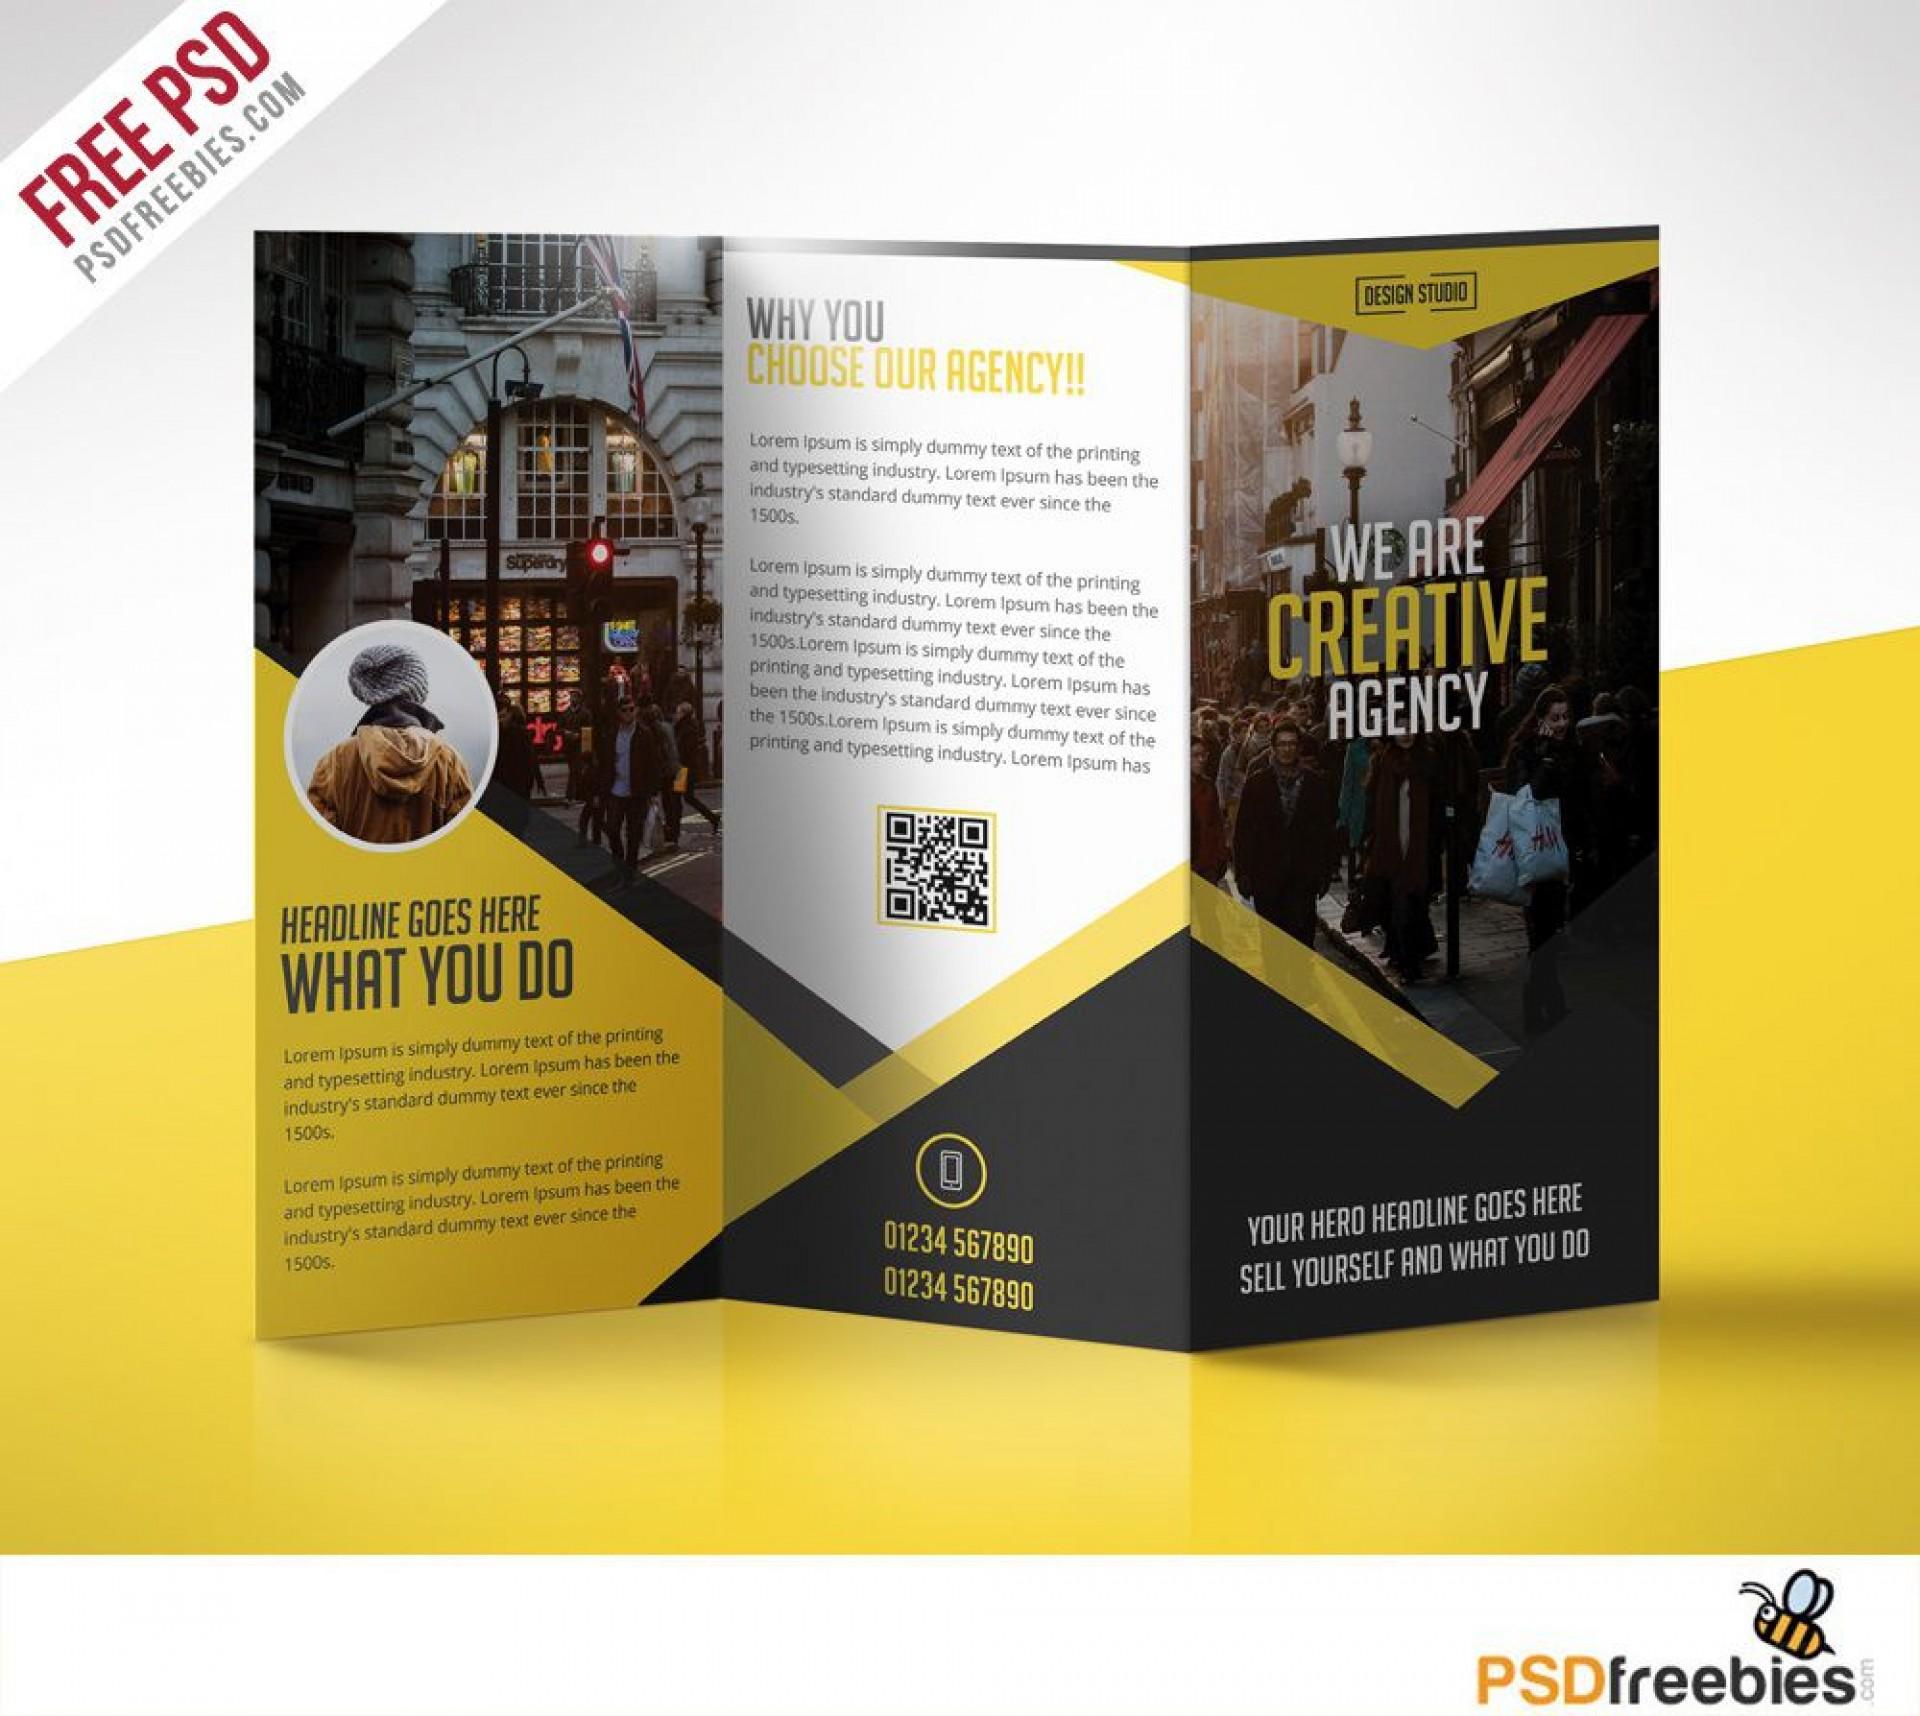 008 Breathtaking Photoshop Brochure Design Template Free Download Photo 1920